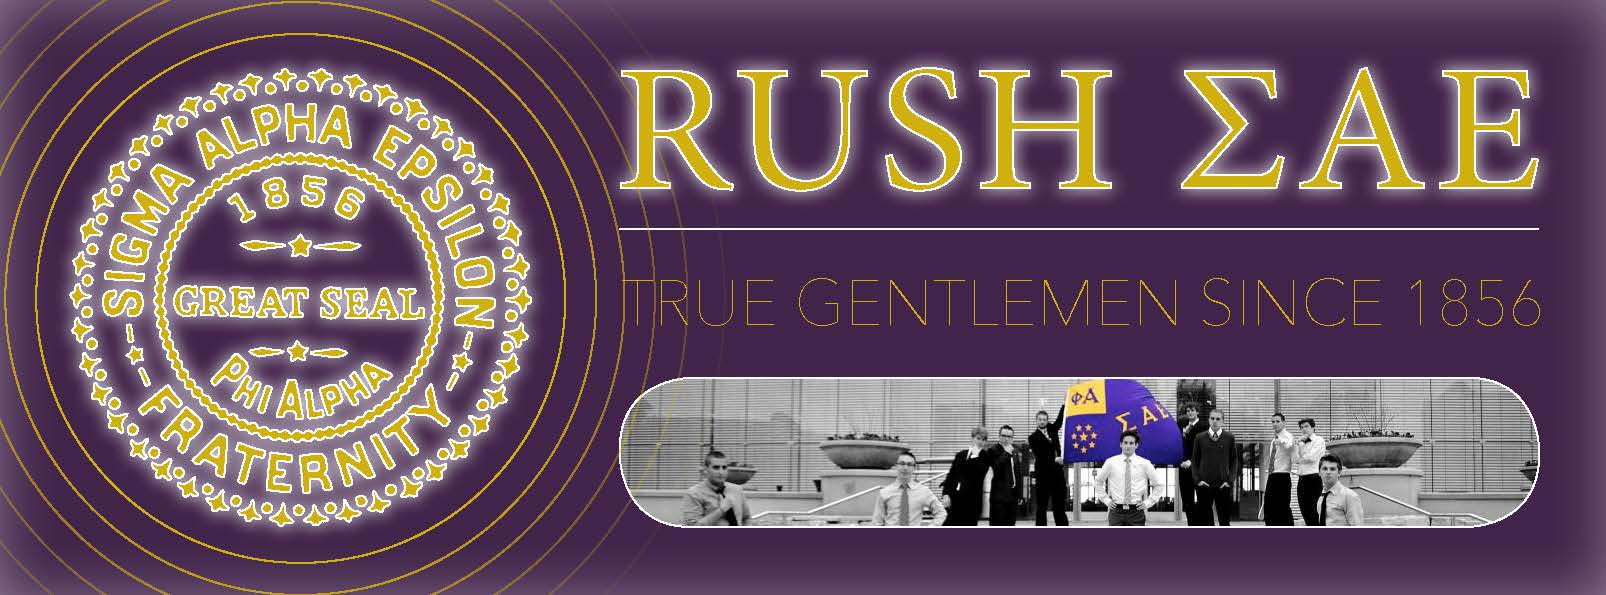 sae rush banner.jpg